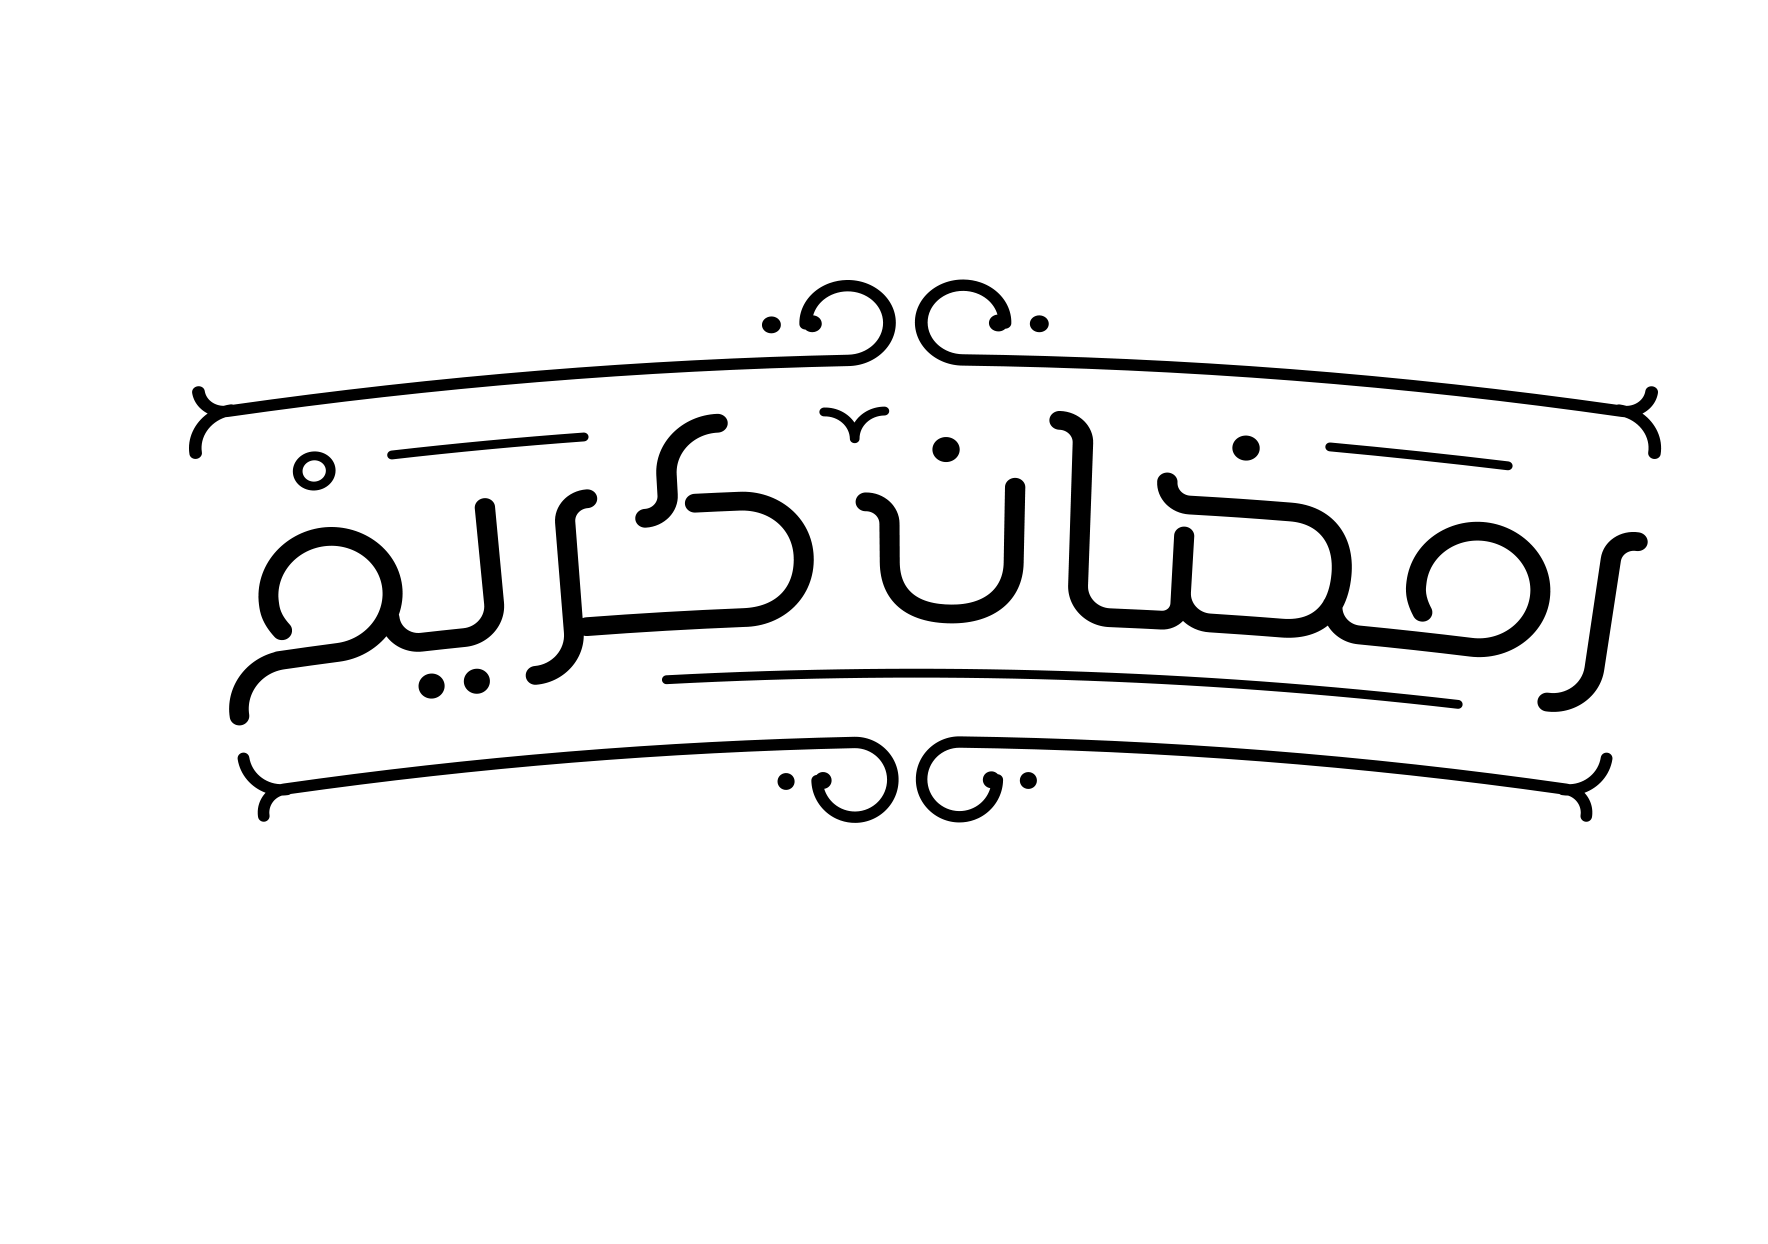 مخطوطه رمضان كريم مفرغه 6 15 مخطوطه لشهر رمضان بالخط الحر png